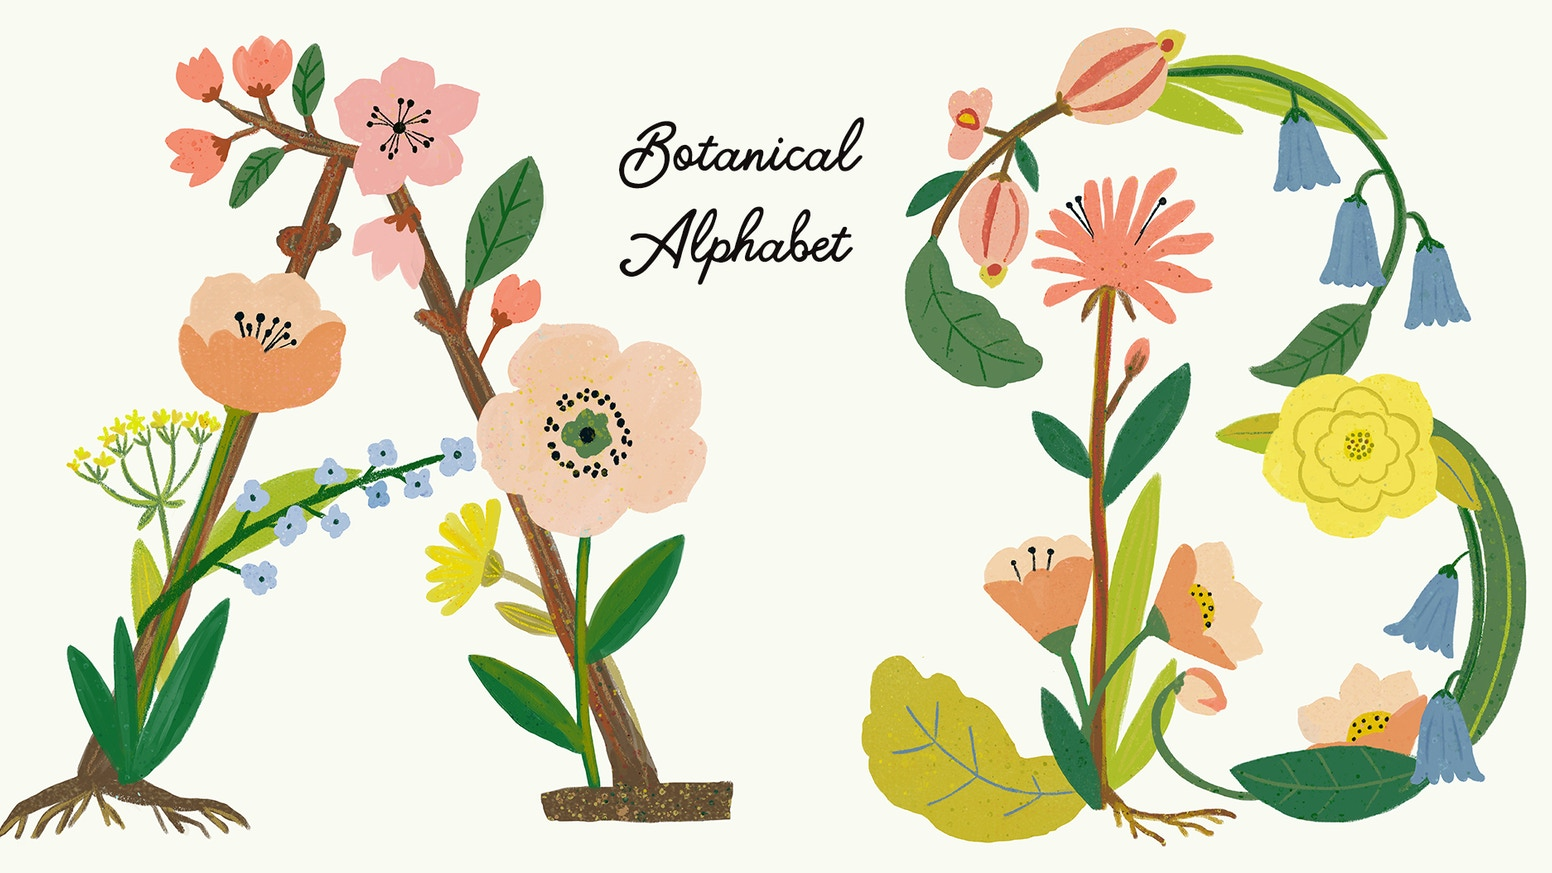 100 Limited Edition Botanical Alphabet Prints